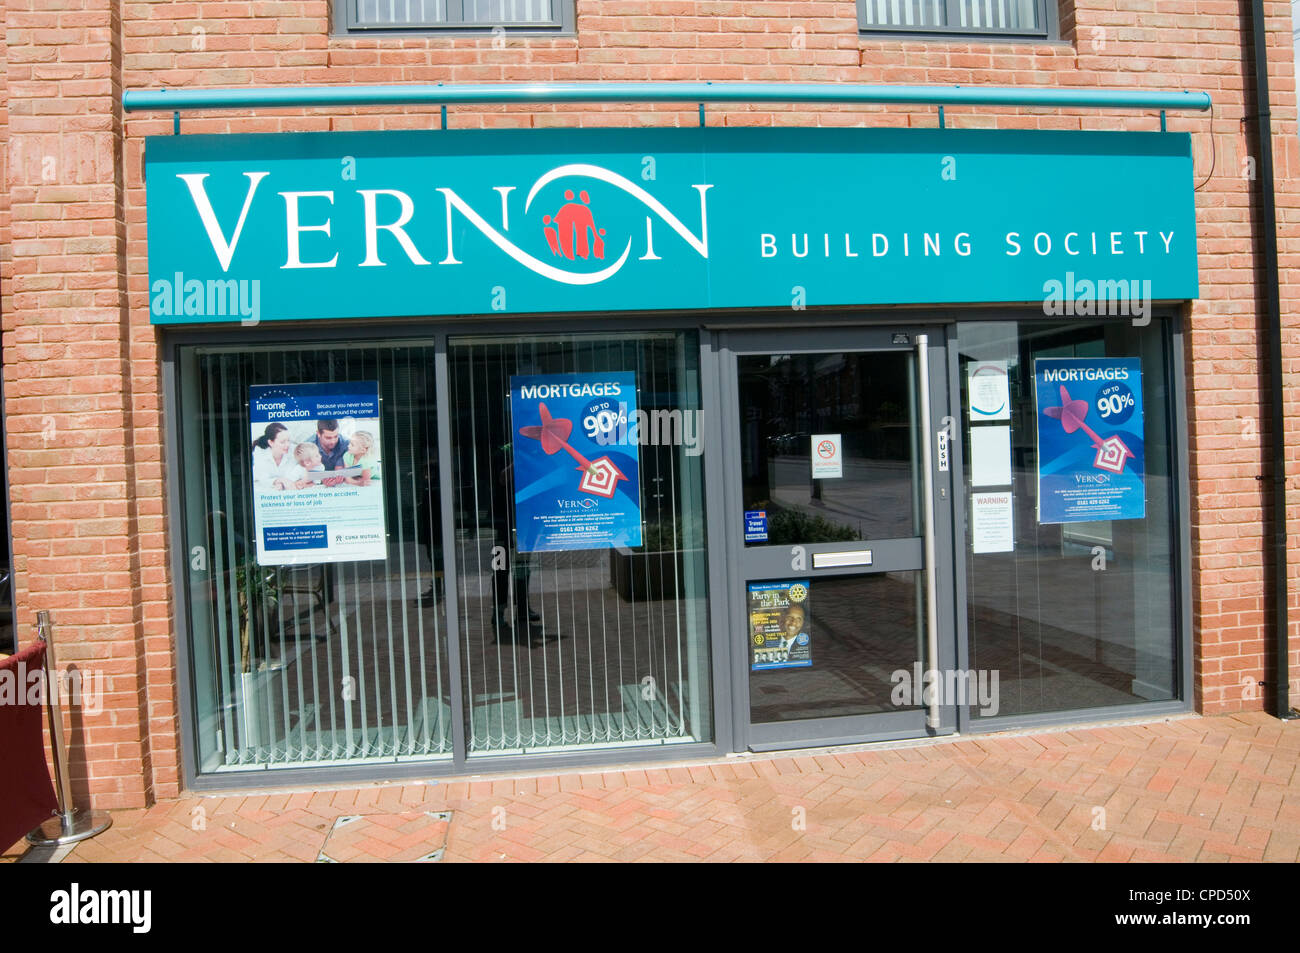 Vernon Building Society stockport manchester regional small societies bank banking highstreet high street - Stock Image